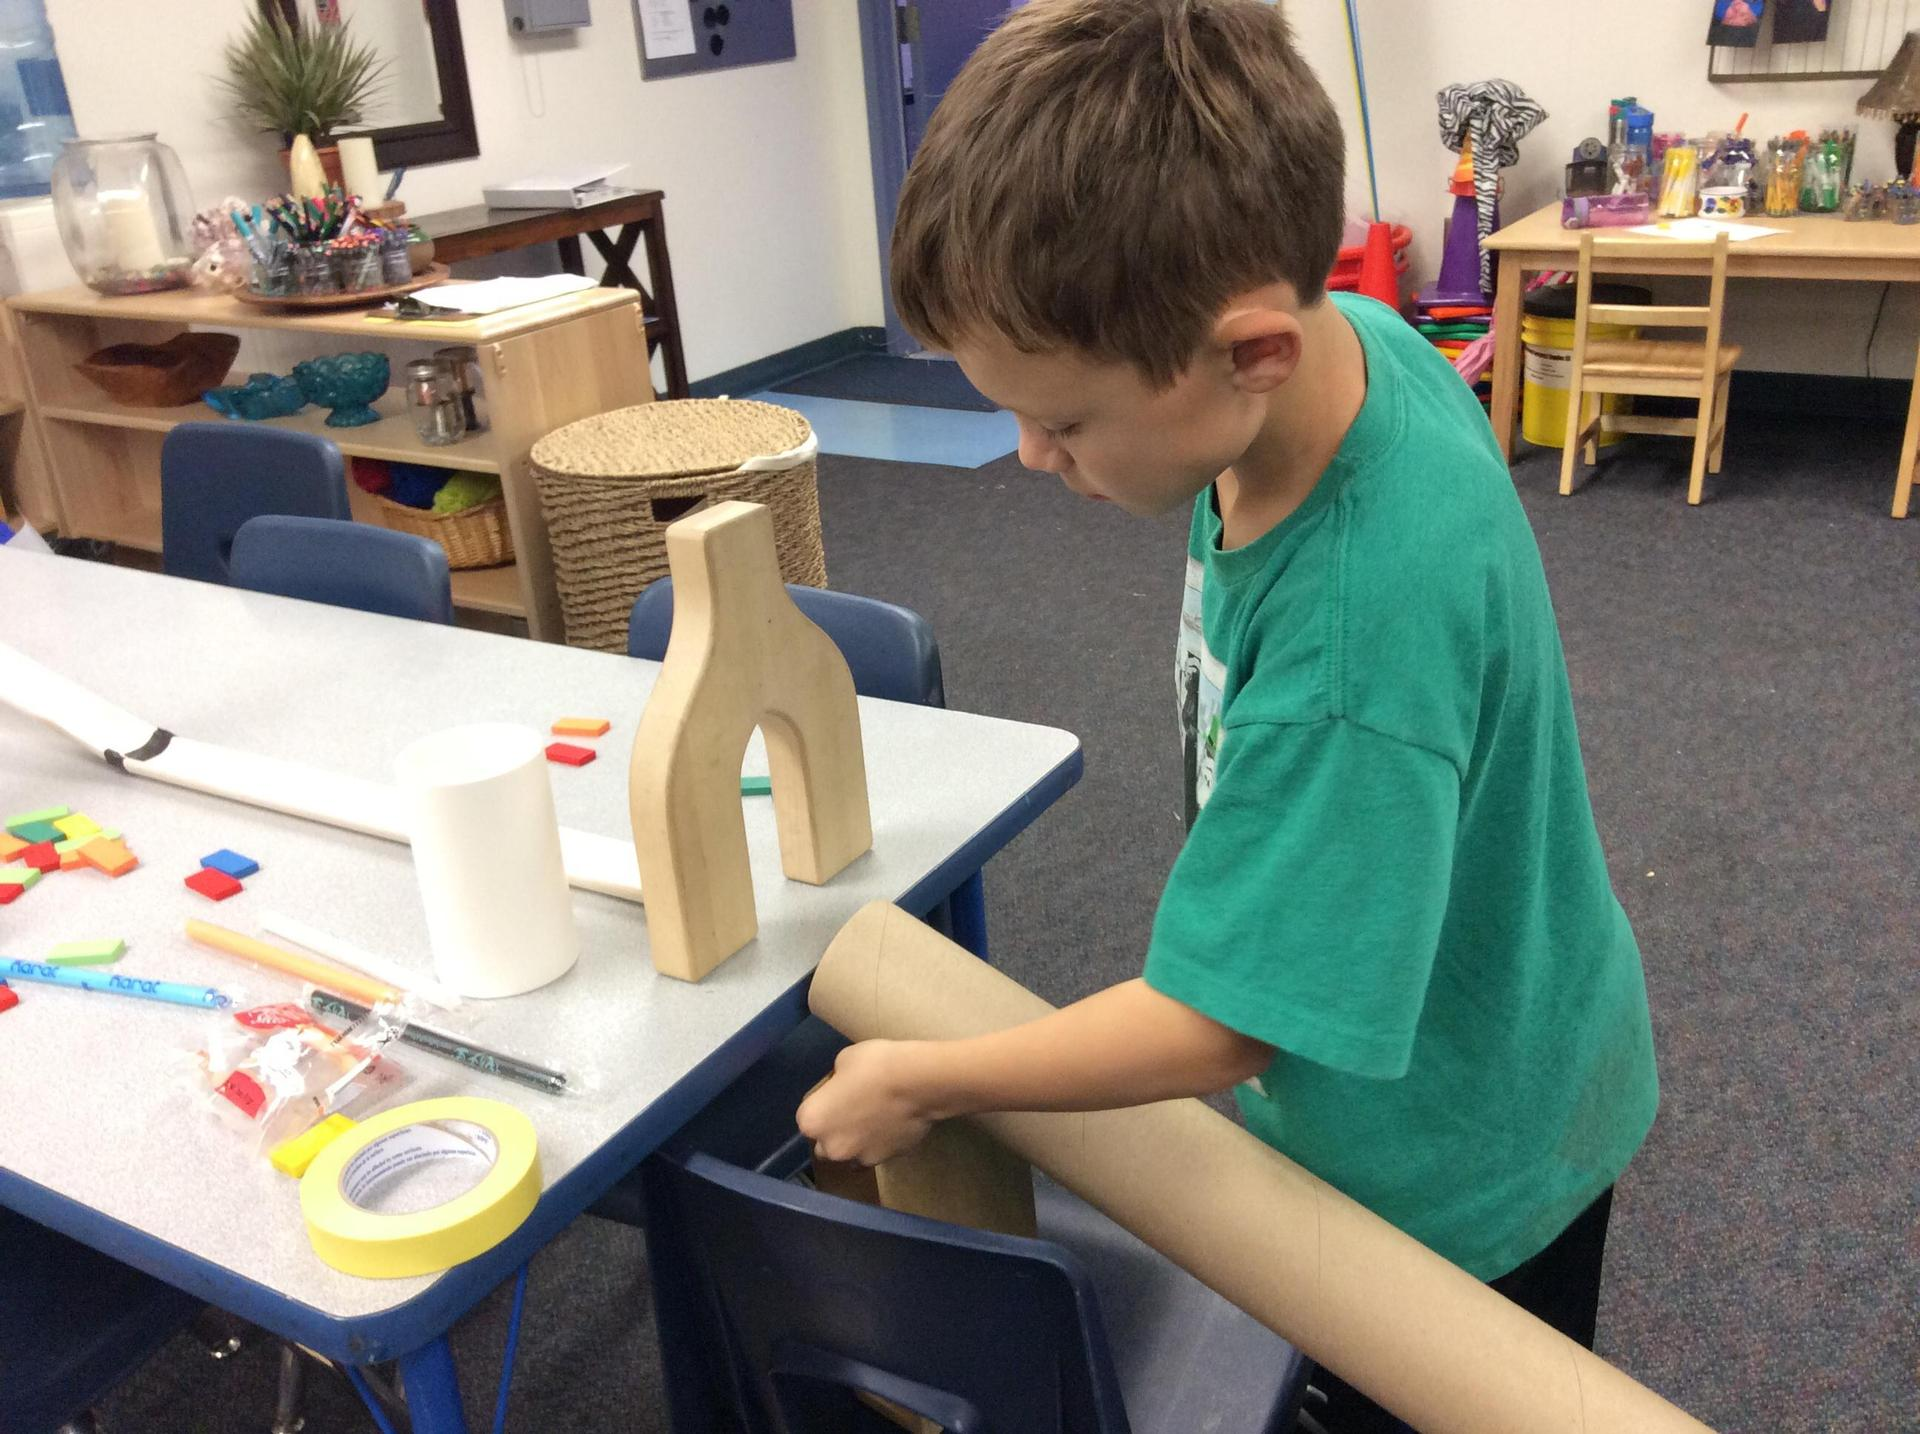 Rube Goldberg challenge creating contraptions.